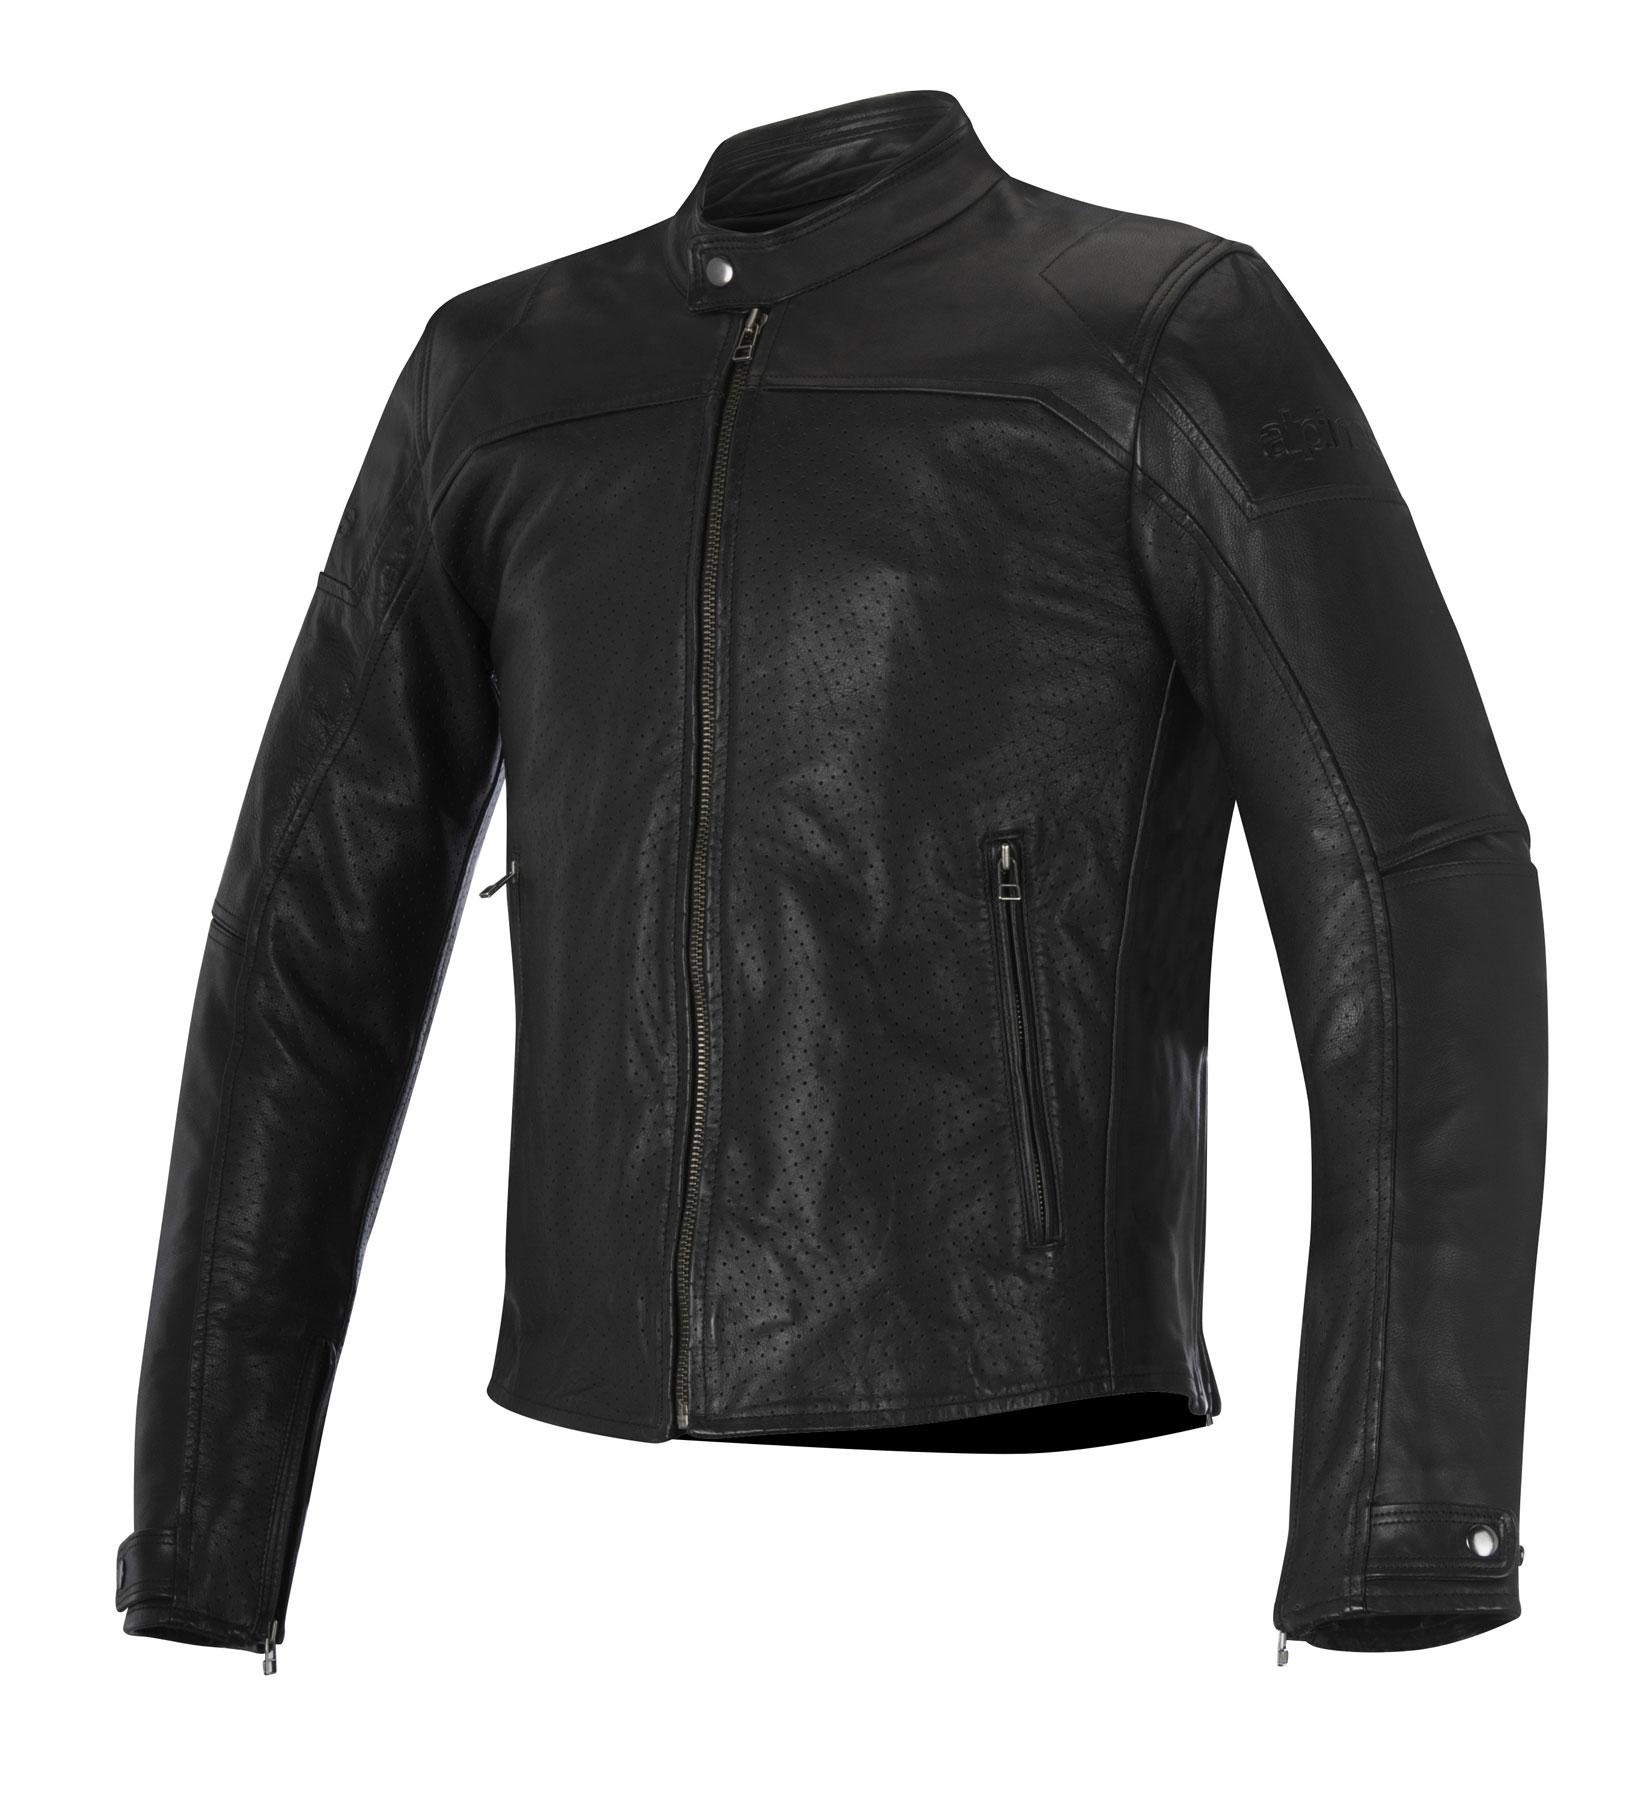 Alpinestars BRERA AIRFLOW Leather Street Motorcycle Jacket (Black)